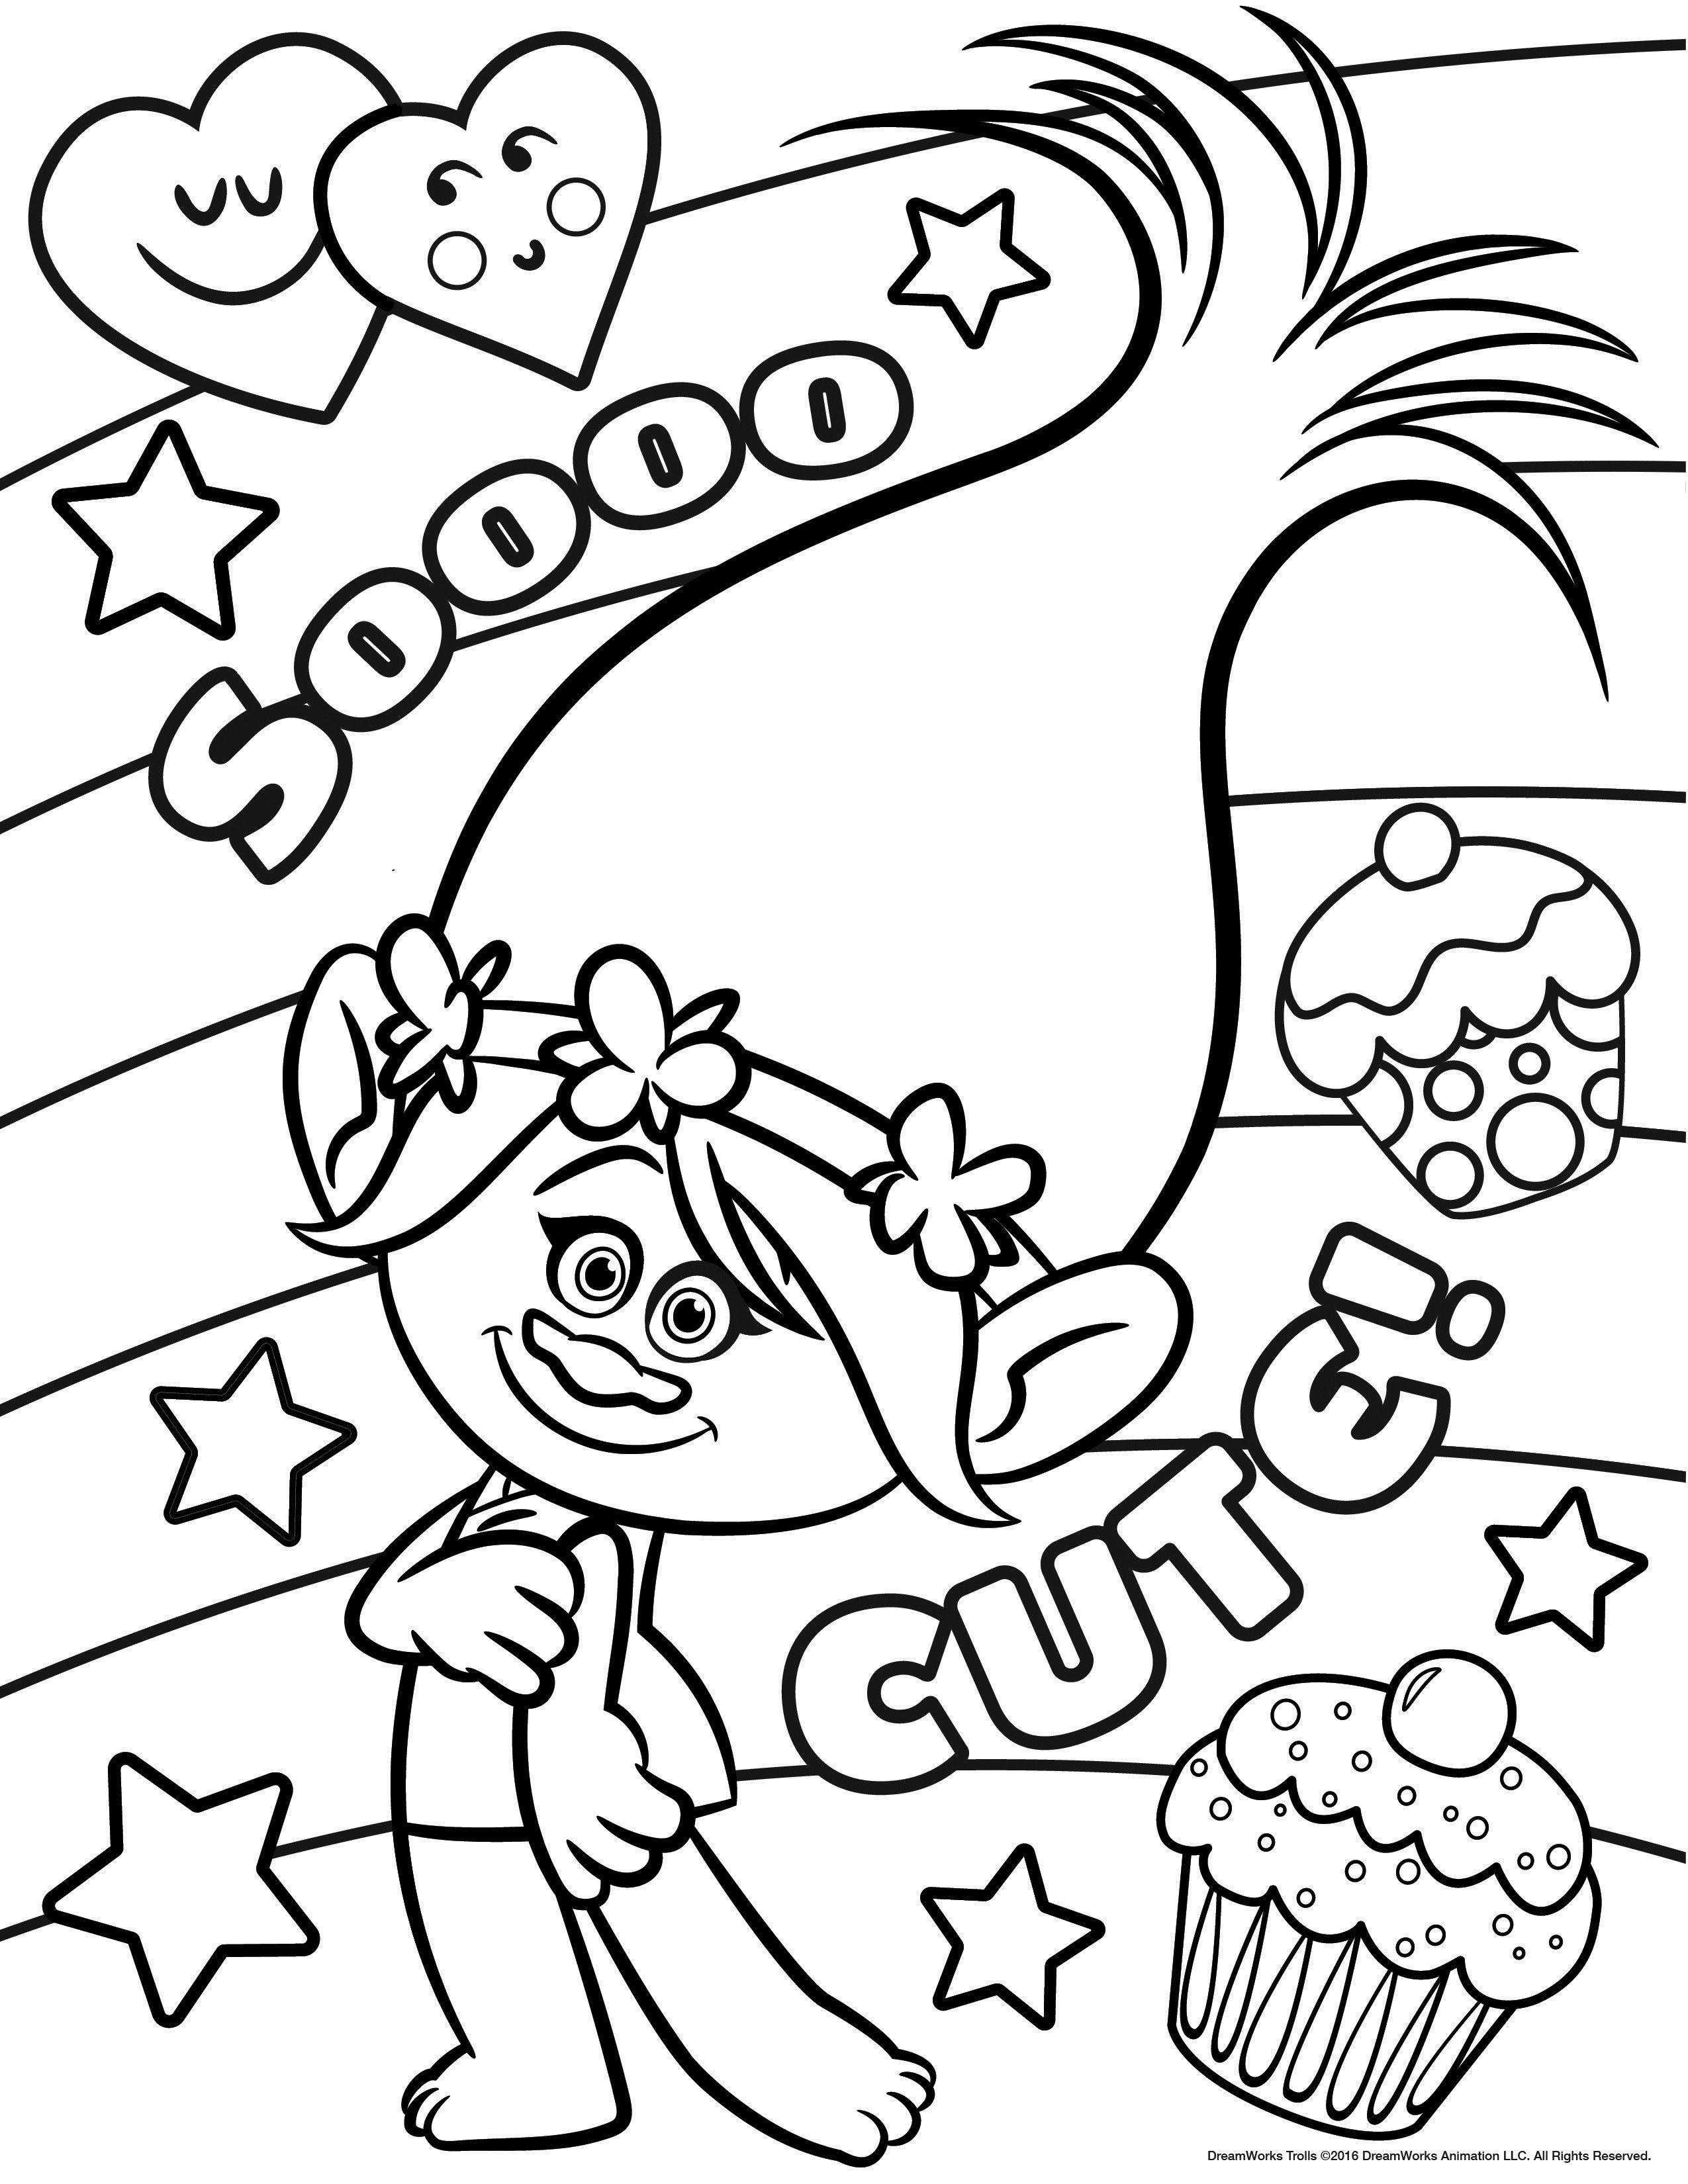 trolls-coloringpage-03.jpg (2550×3300) | kolorowanki | Pinterest